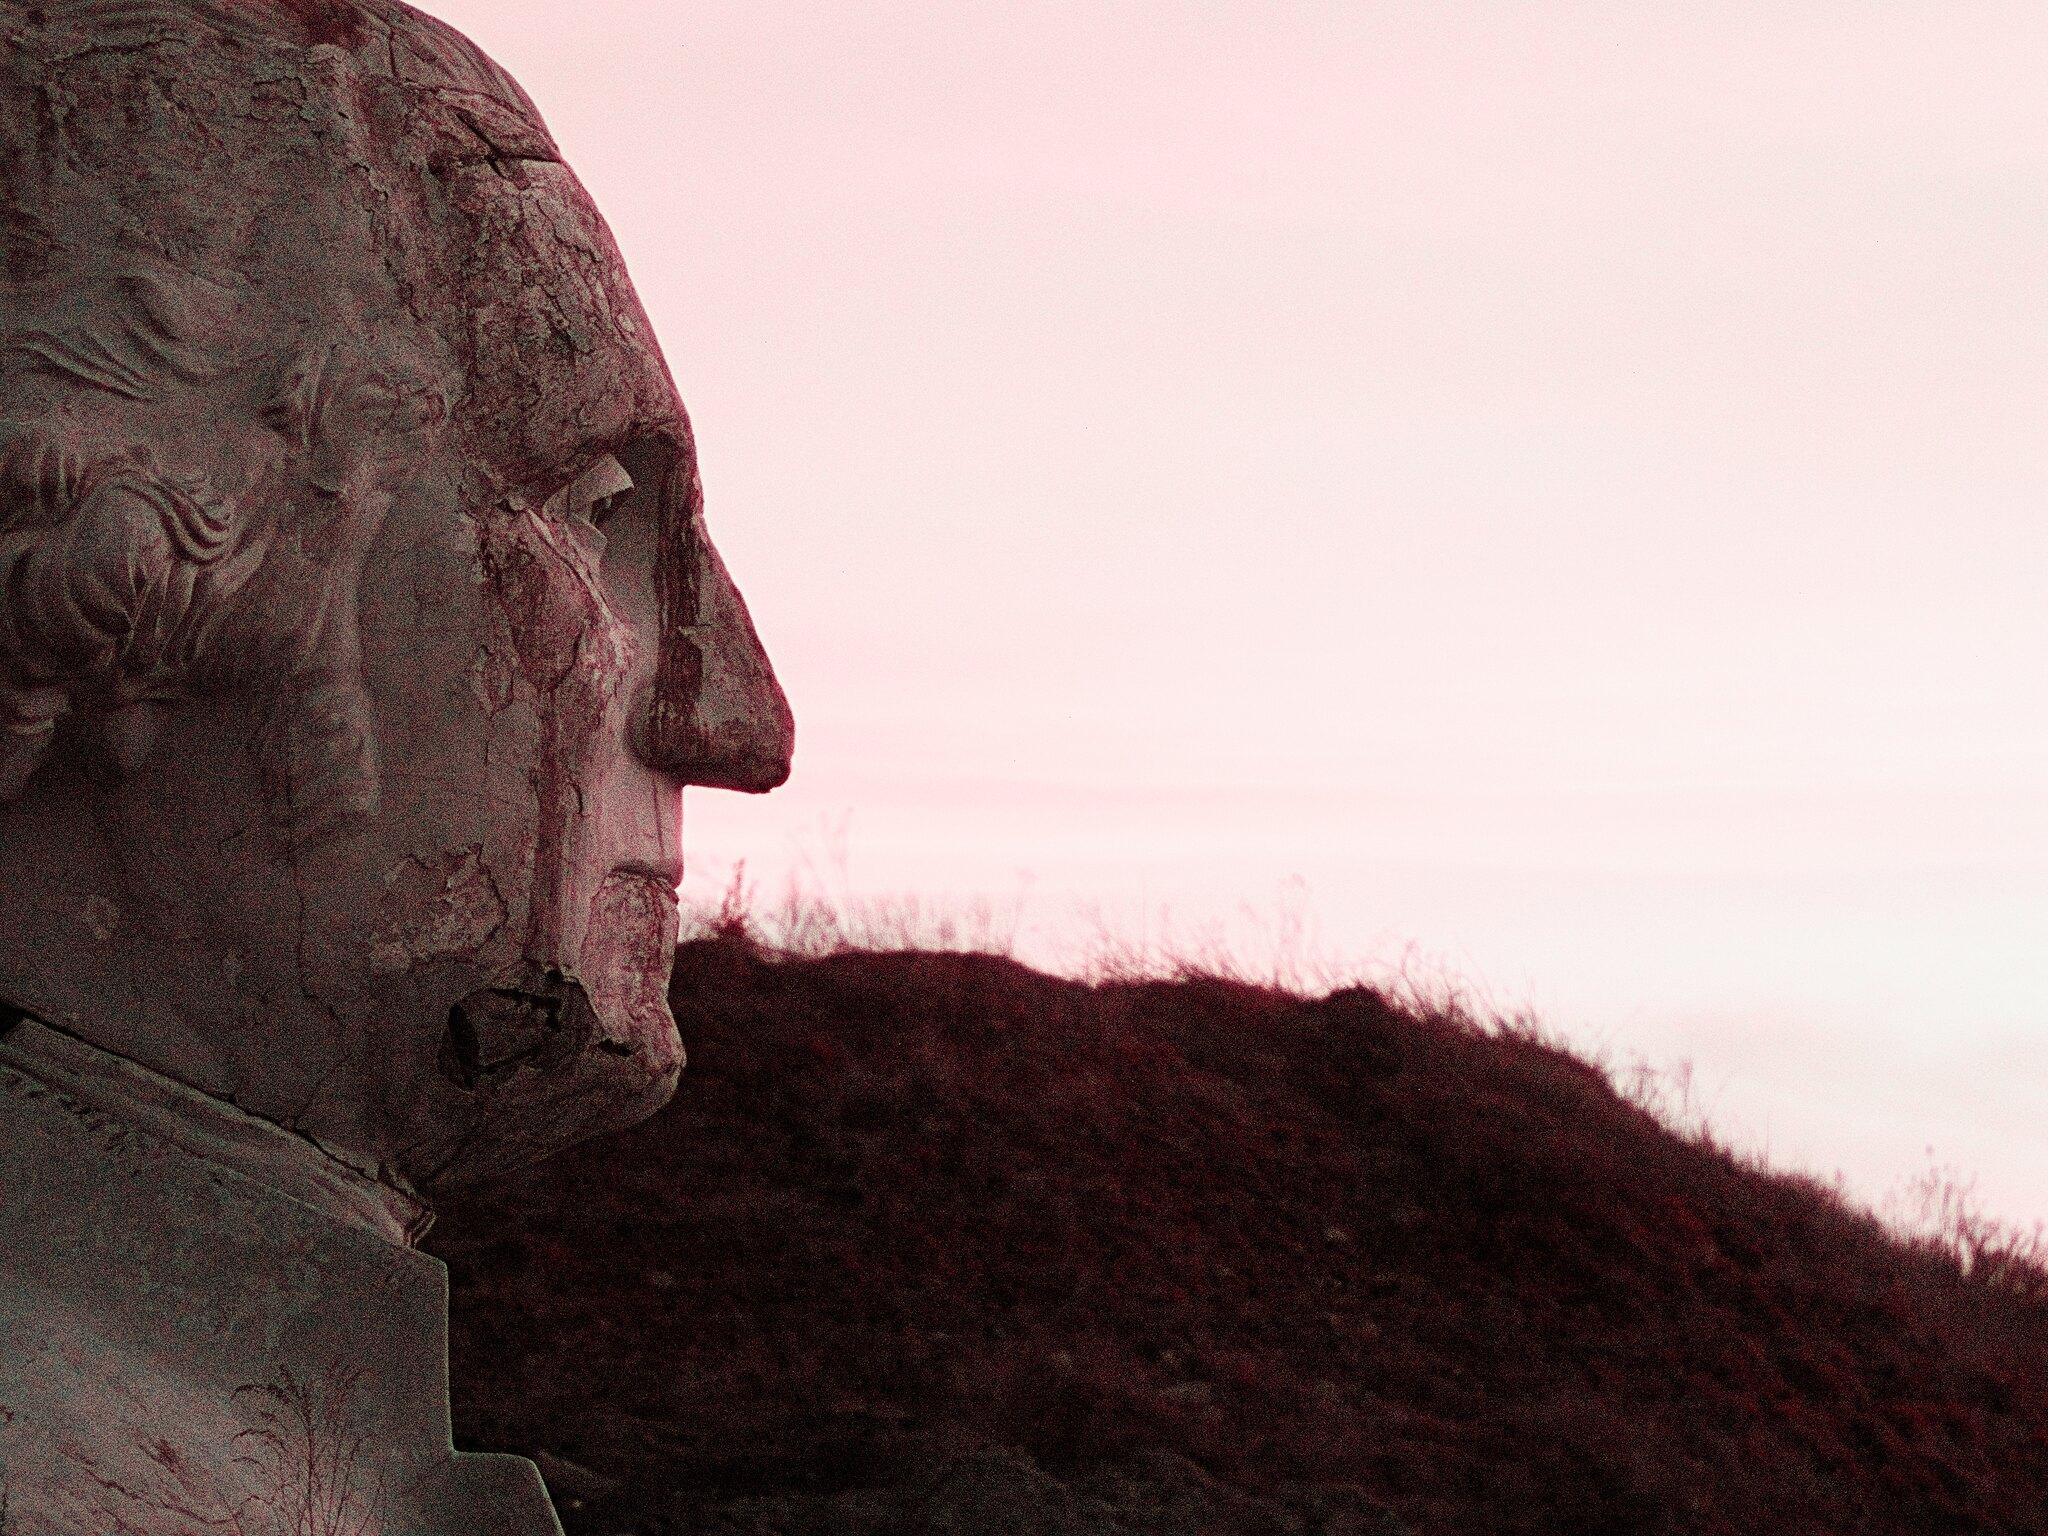 President's Park Abandoned Heads | Williamsburg, Virginia